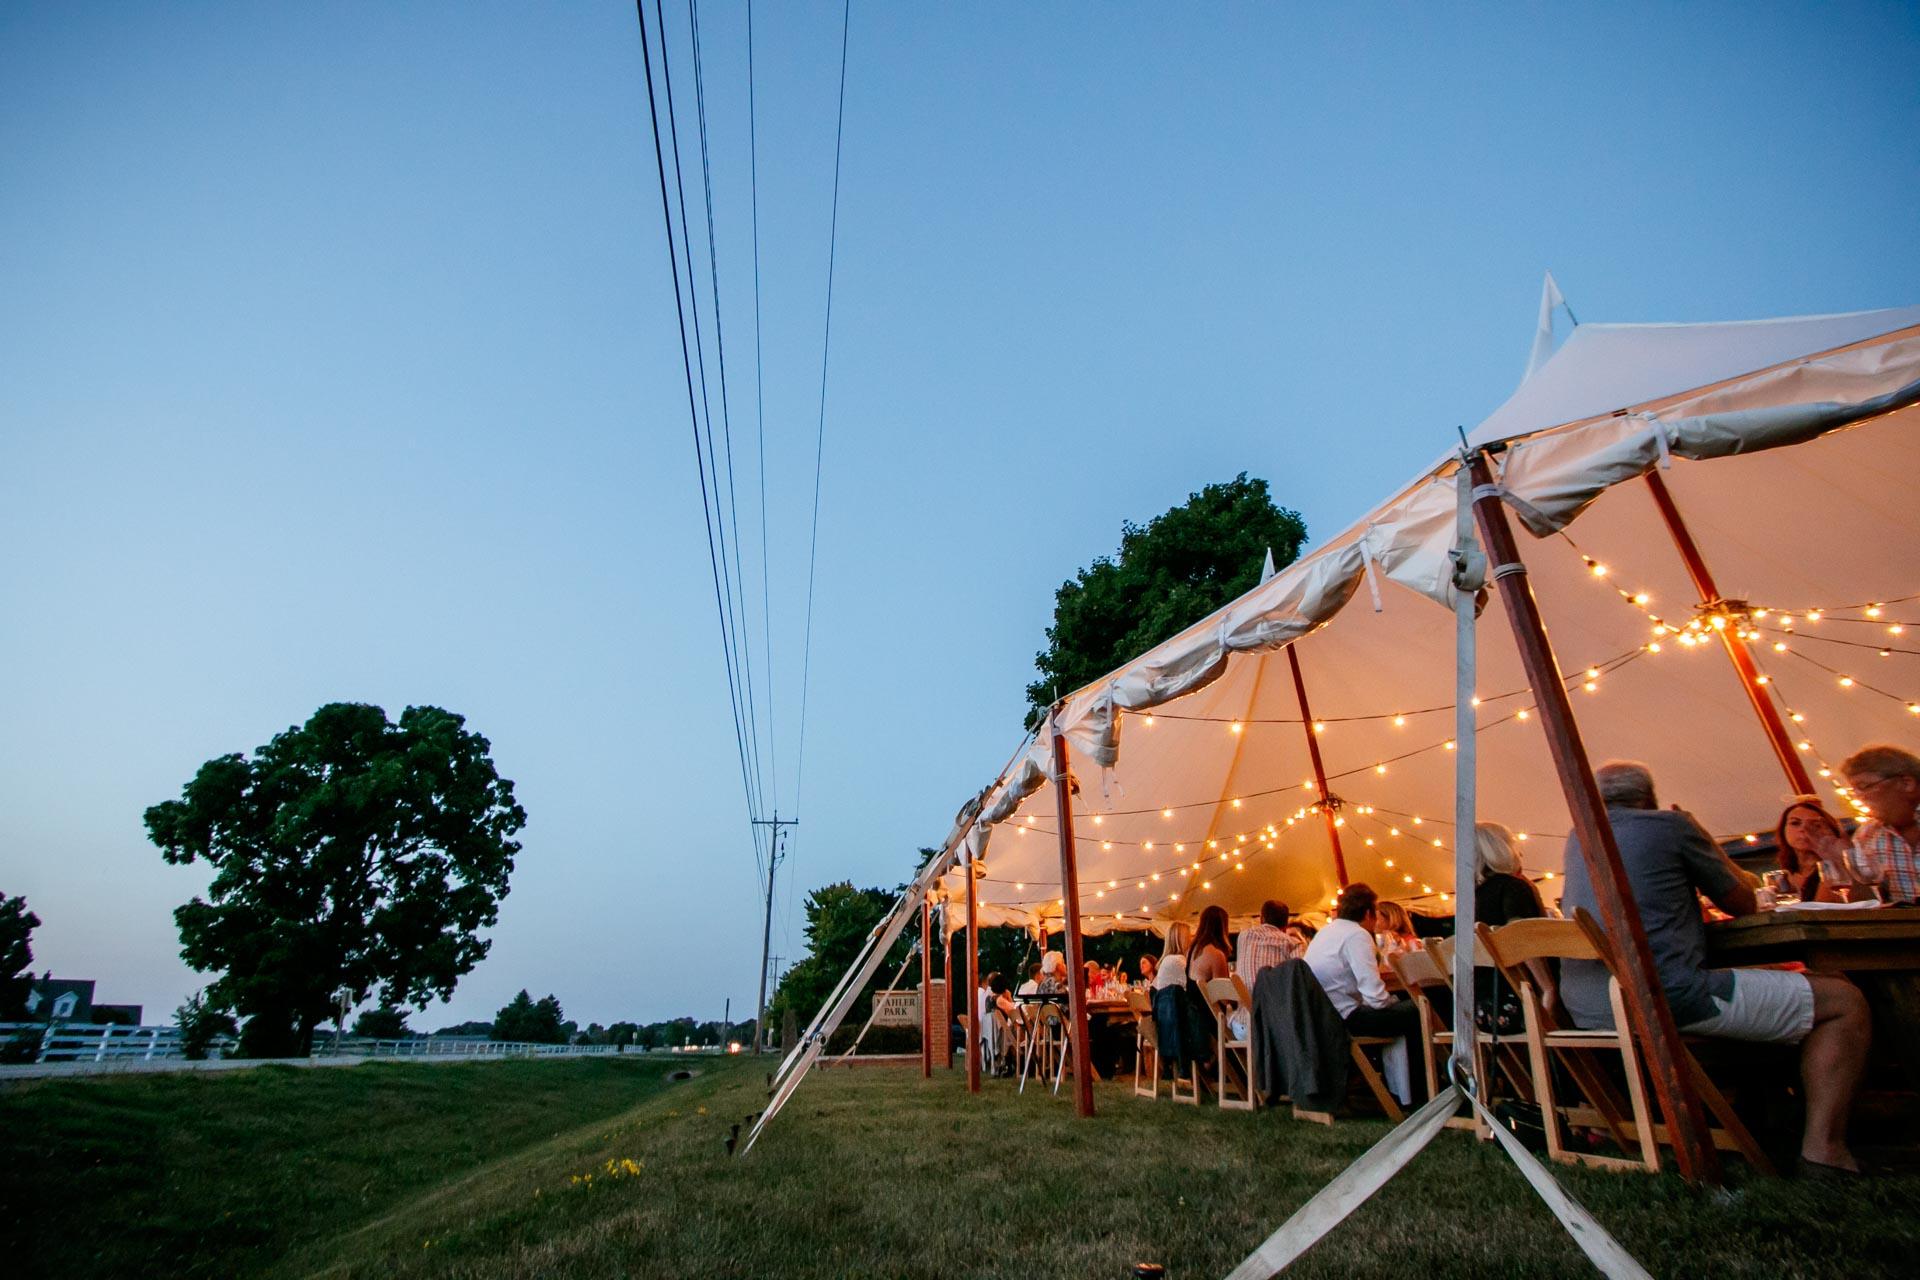 future-neenah-sunset-dinner-farm-to-table-adam-shea-photography-green-bay-appleton-neenah-photographer-15.jpg